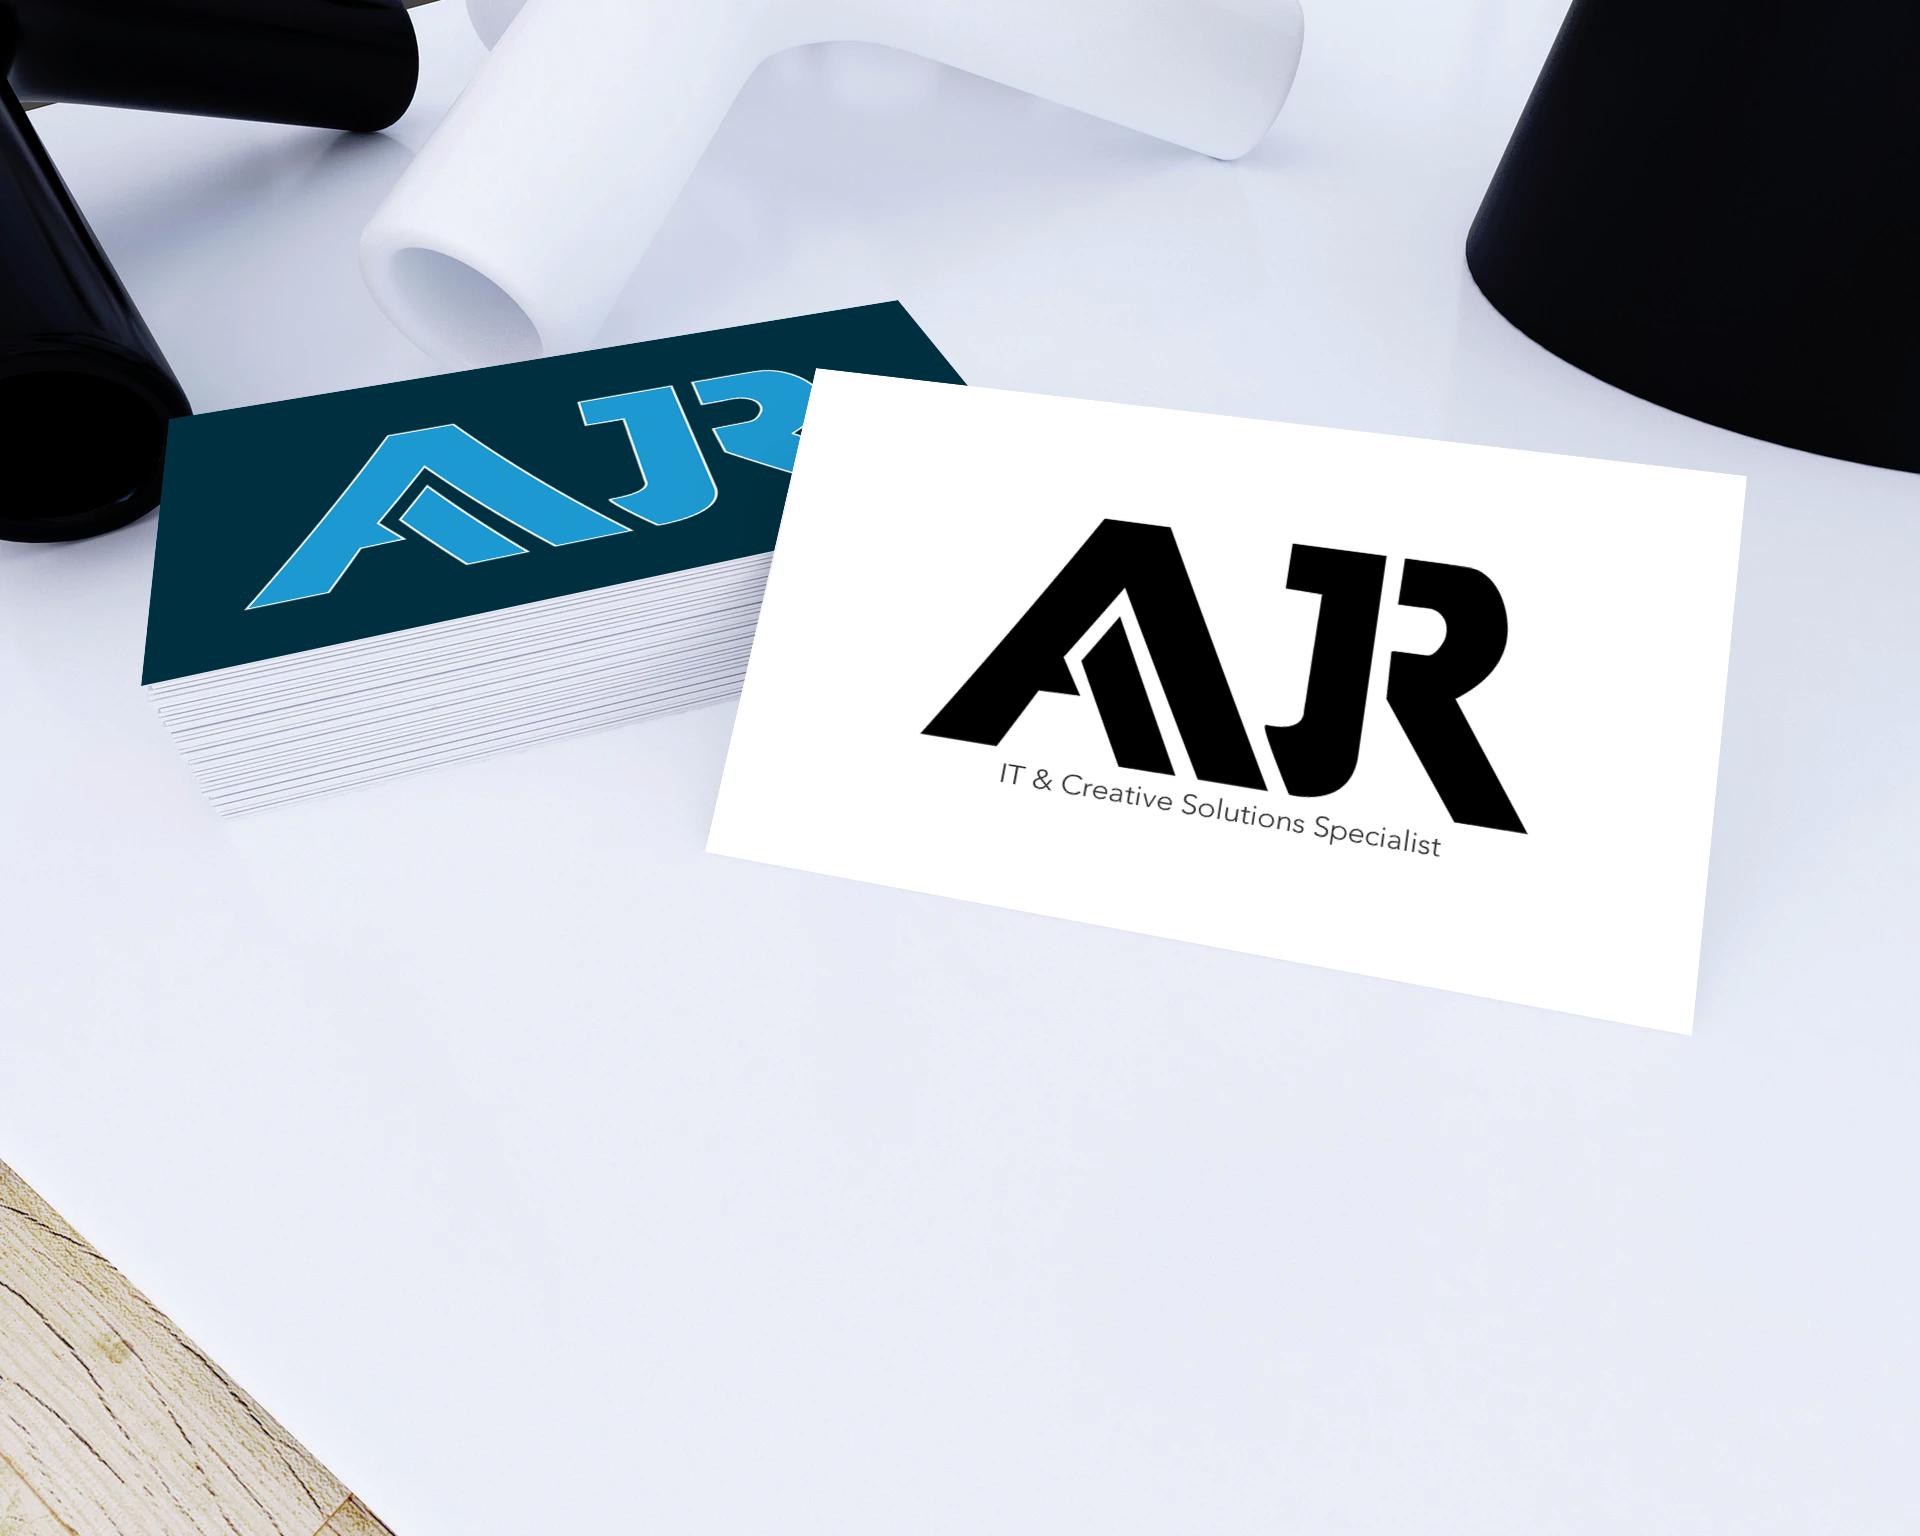 AJR Logo & Brand Identity Design_12